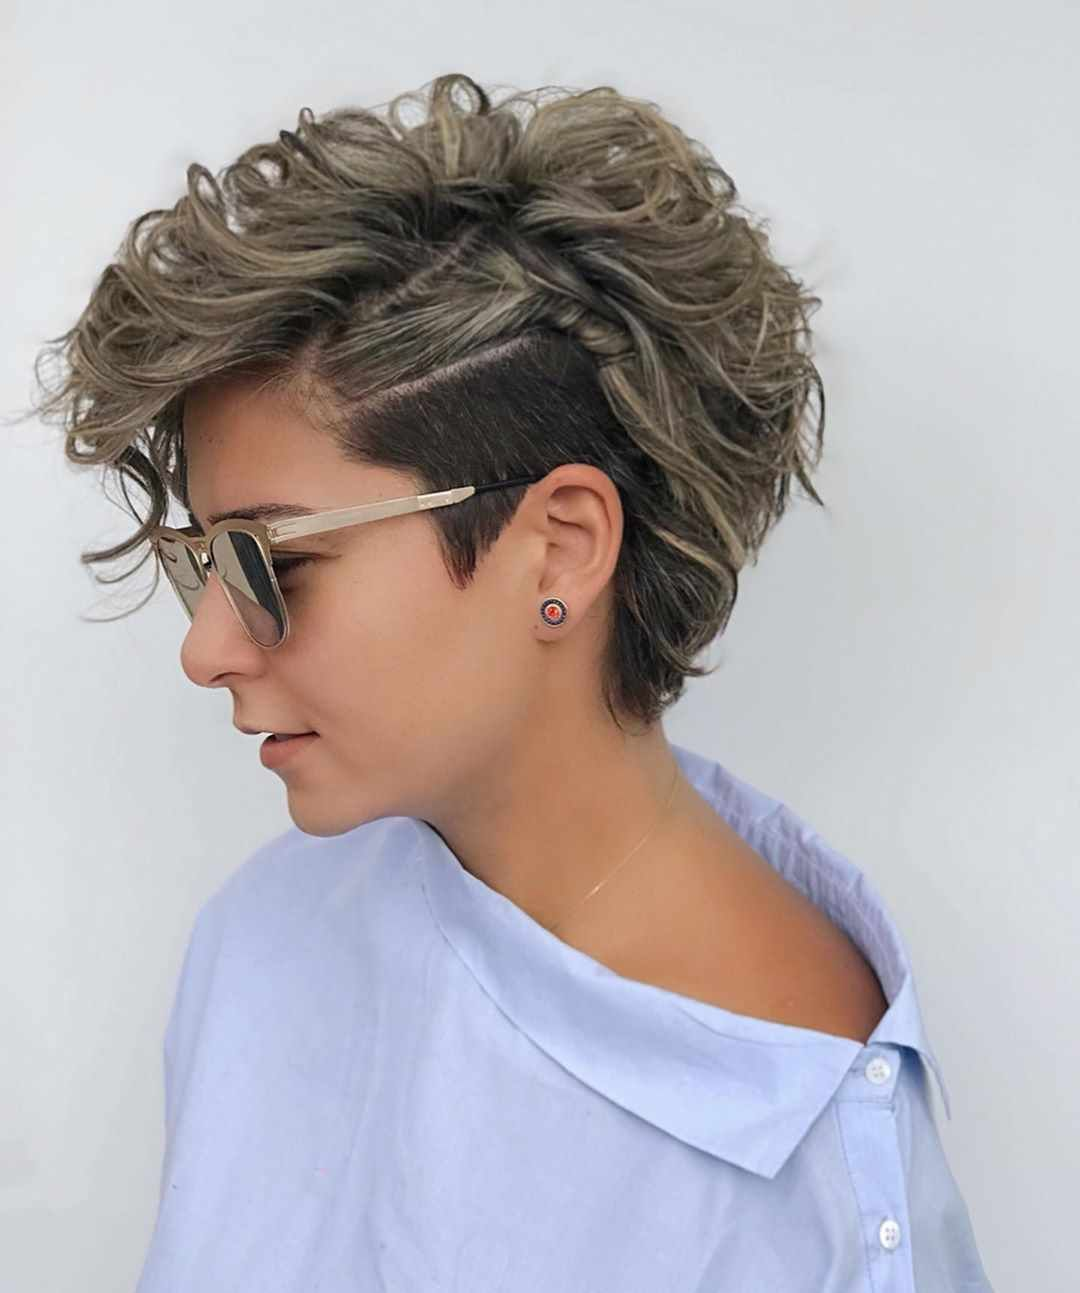 Https Www Hairstylesamples Com Wp Content Uploads 2019 10 Igshidsap5inn6k0ts Jpg Kapsels Pixie Kapsels Kapsels Voor Kort Haar